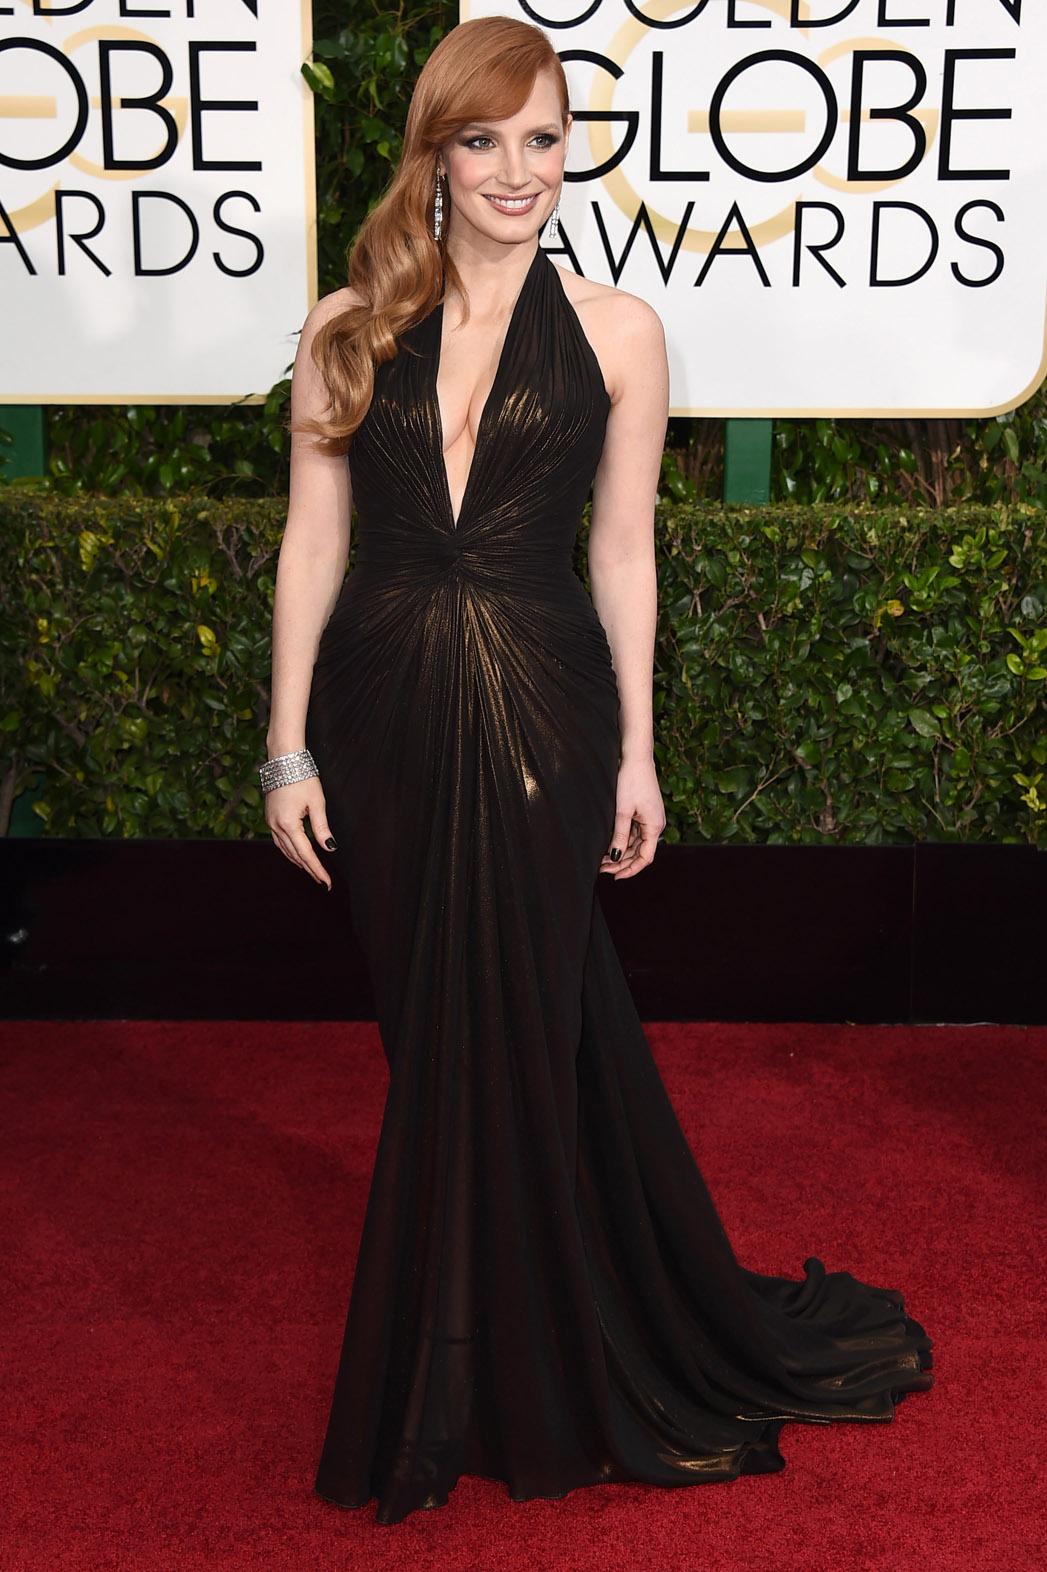 Jessica Chastain - P 2015